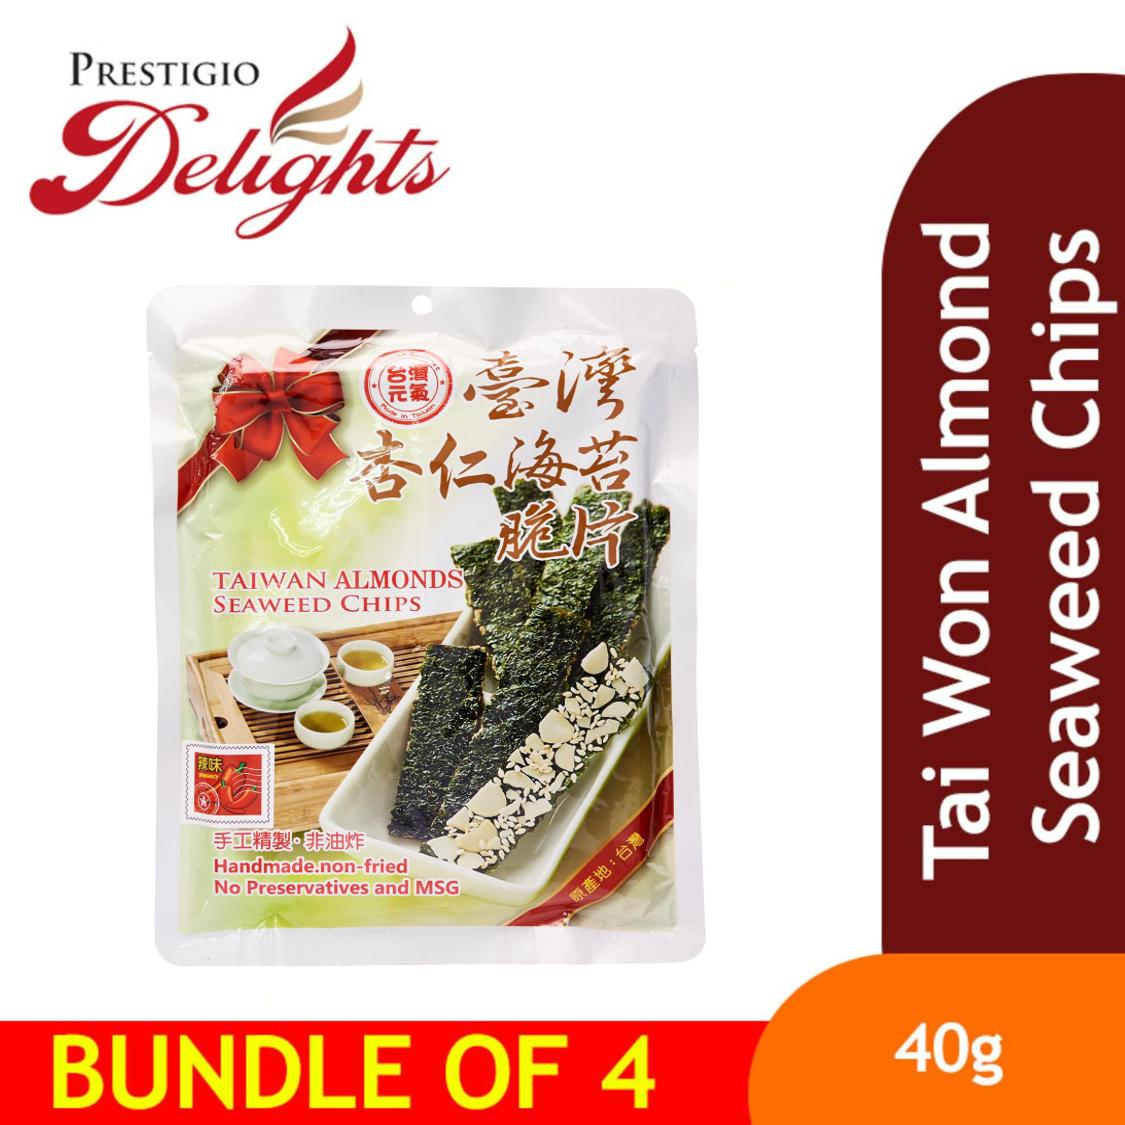 Tai Won Almond Seaweed Chips Bundle Of 4 By Prestigio Delights.